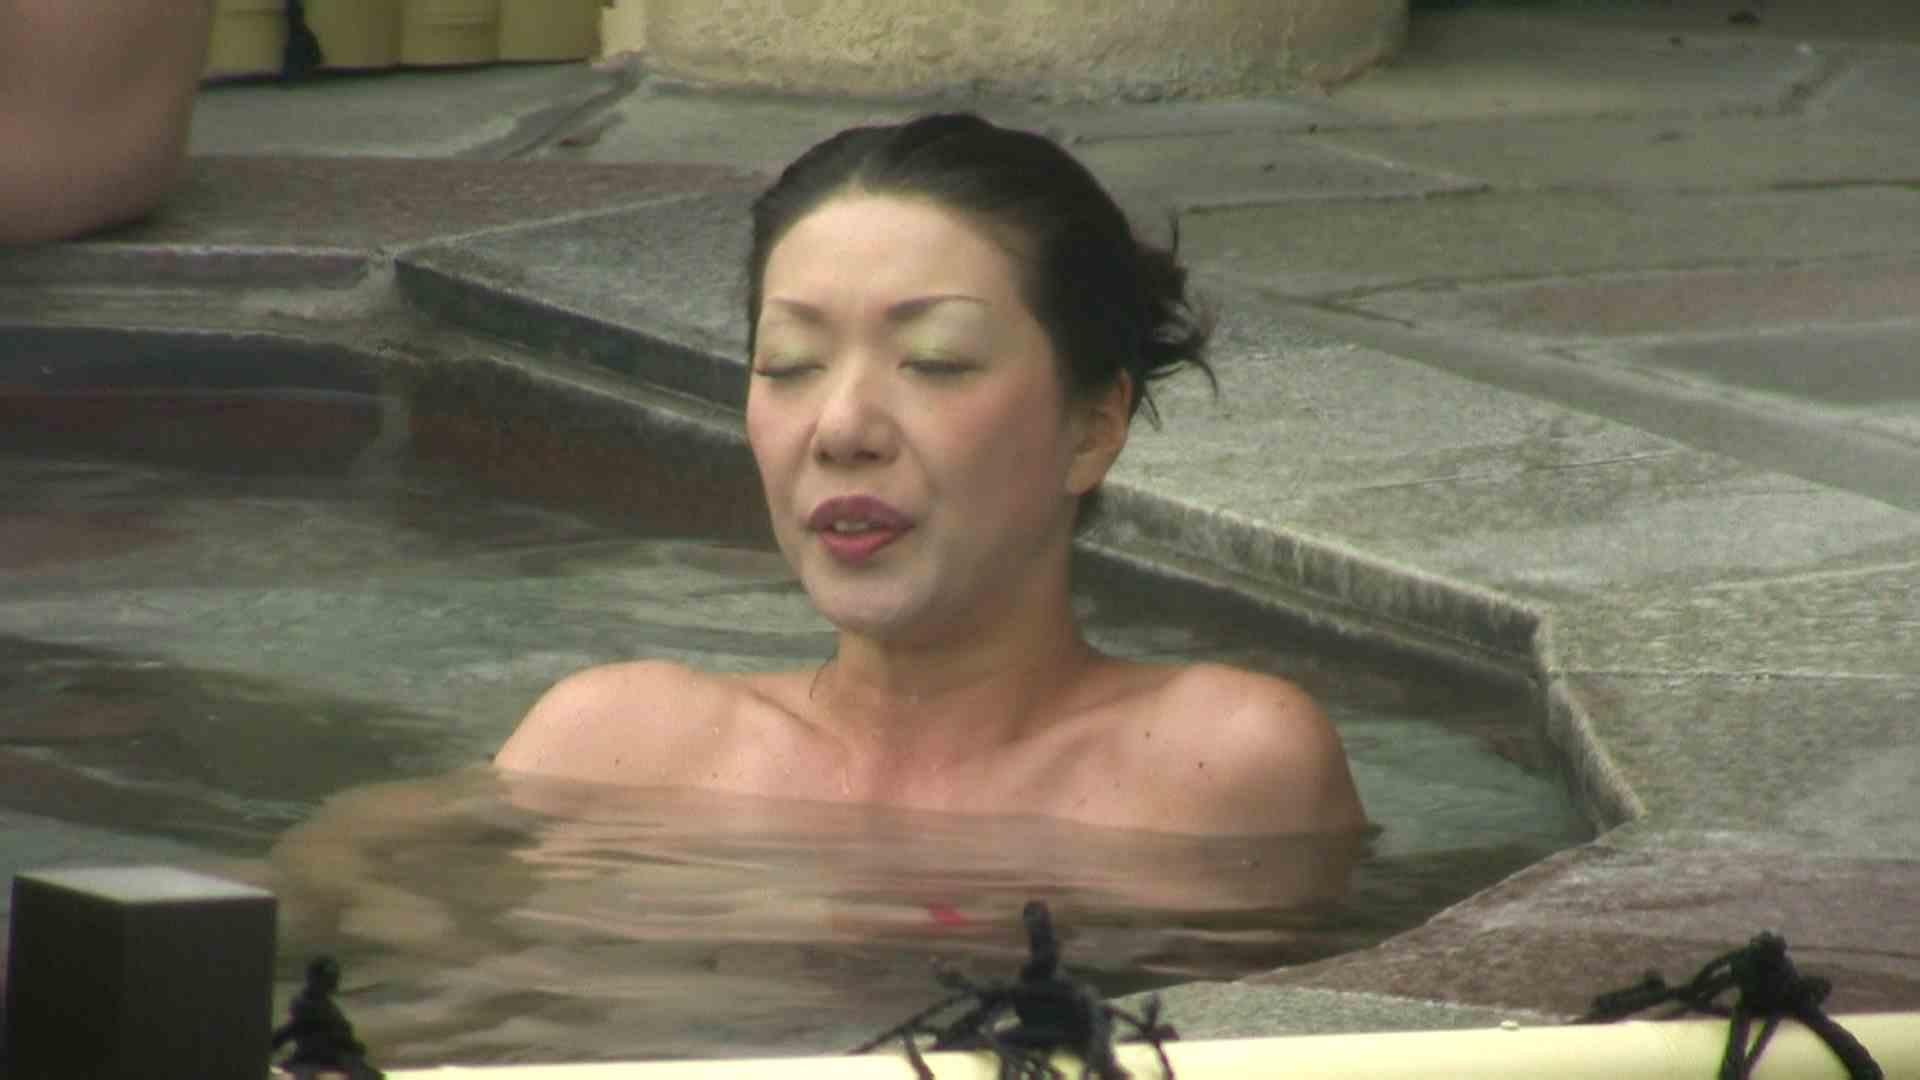 高画質露天女風呂観察 vol.036 OLセックス | 乙女  96画像 1